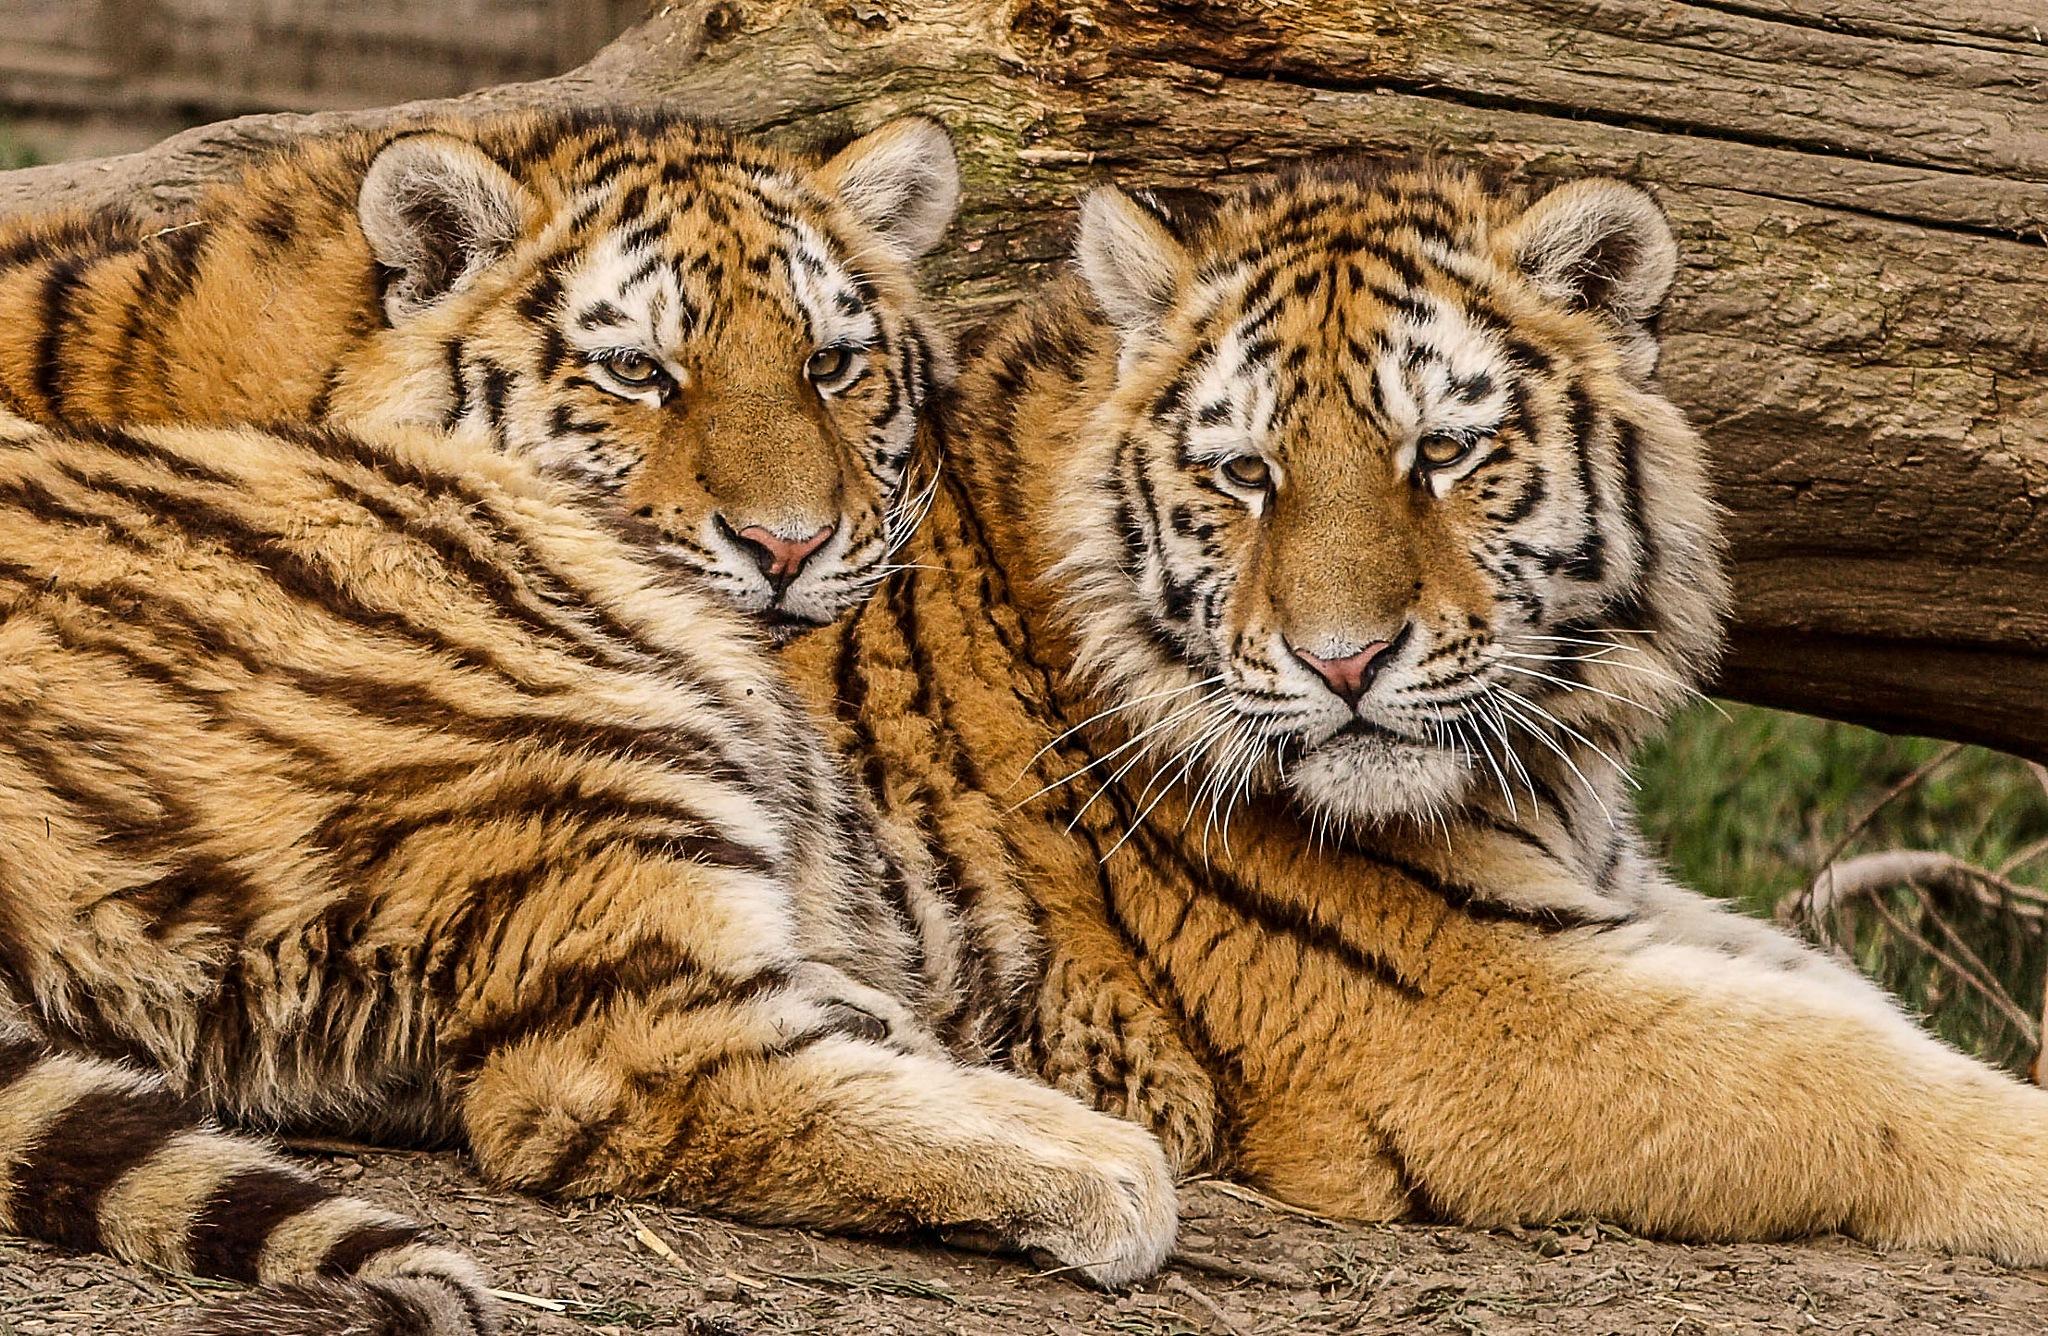 Snug cubs by garry-chisholm1